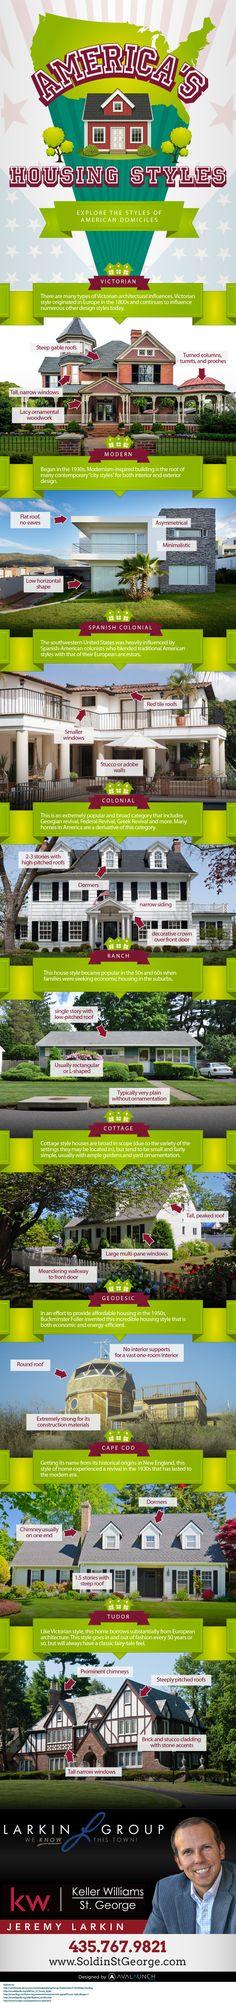 America's Housing Syles